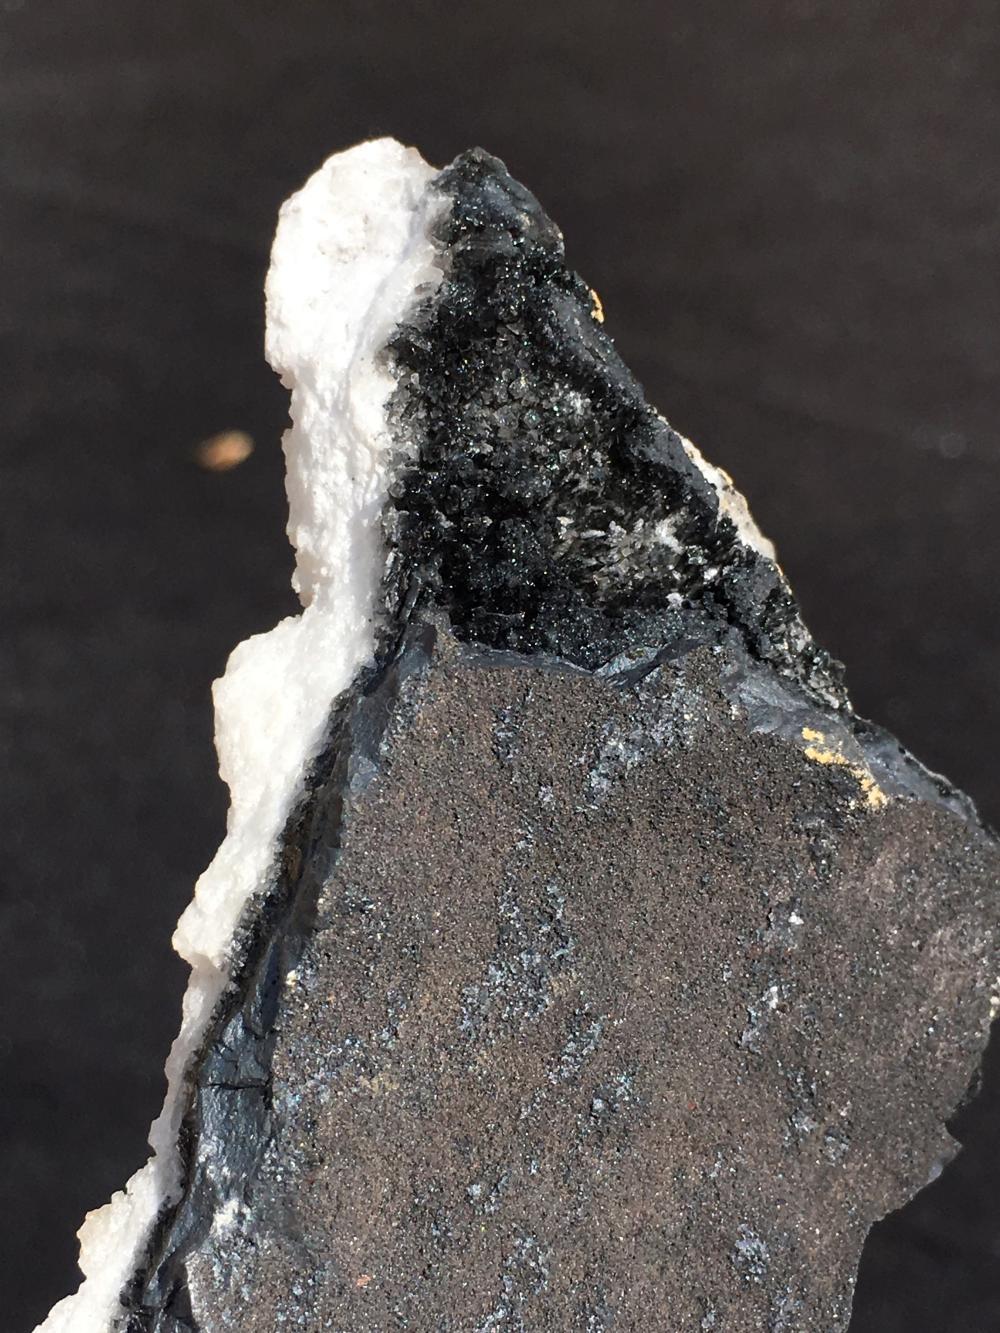 Lot 287: Calcite, Psilomene, Rock, Crystal, Natural, Collectible, Mineral, Specimen